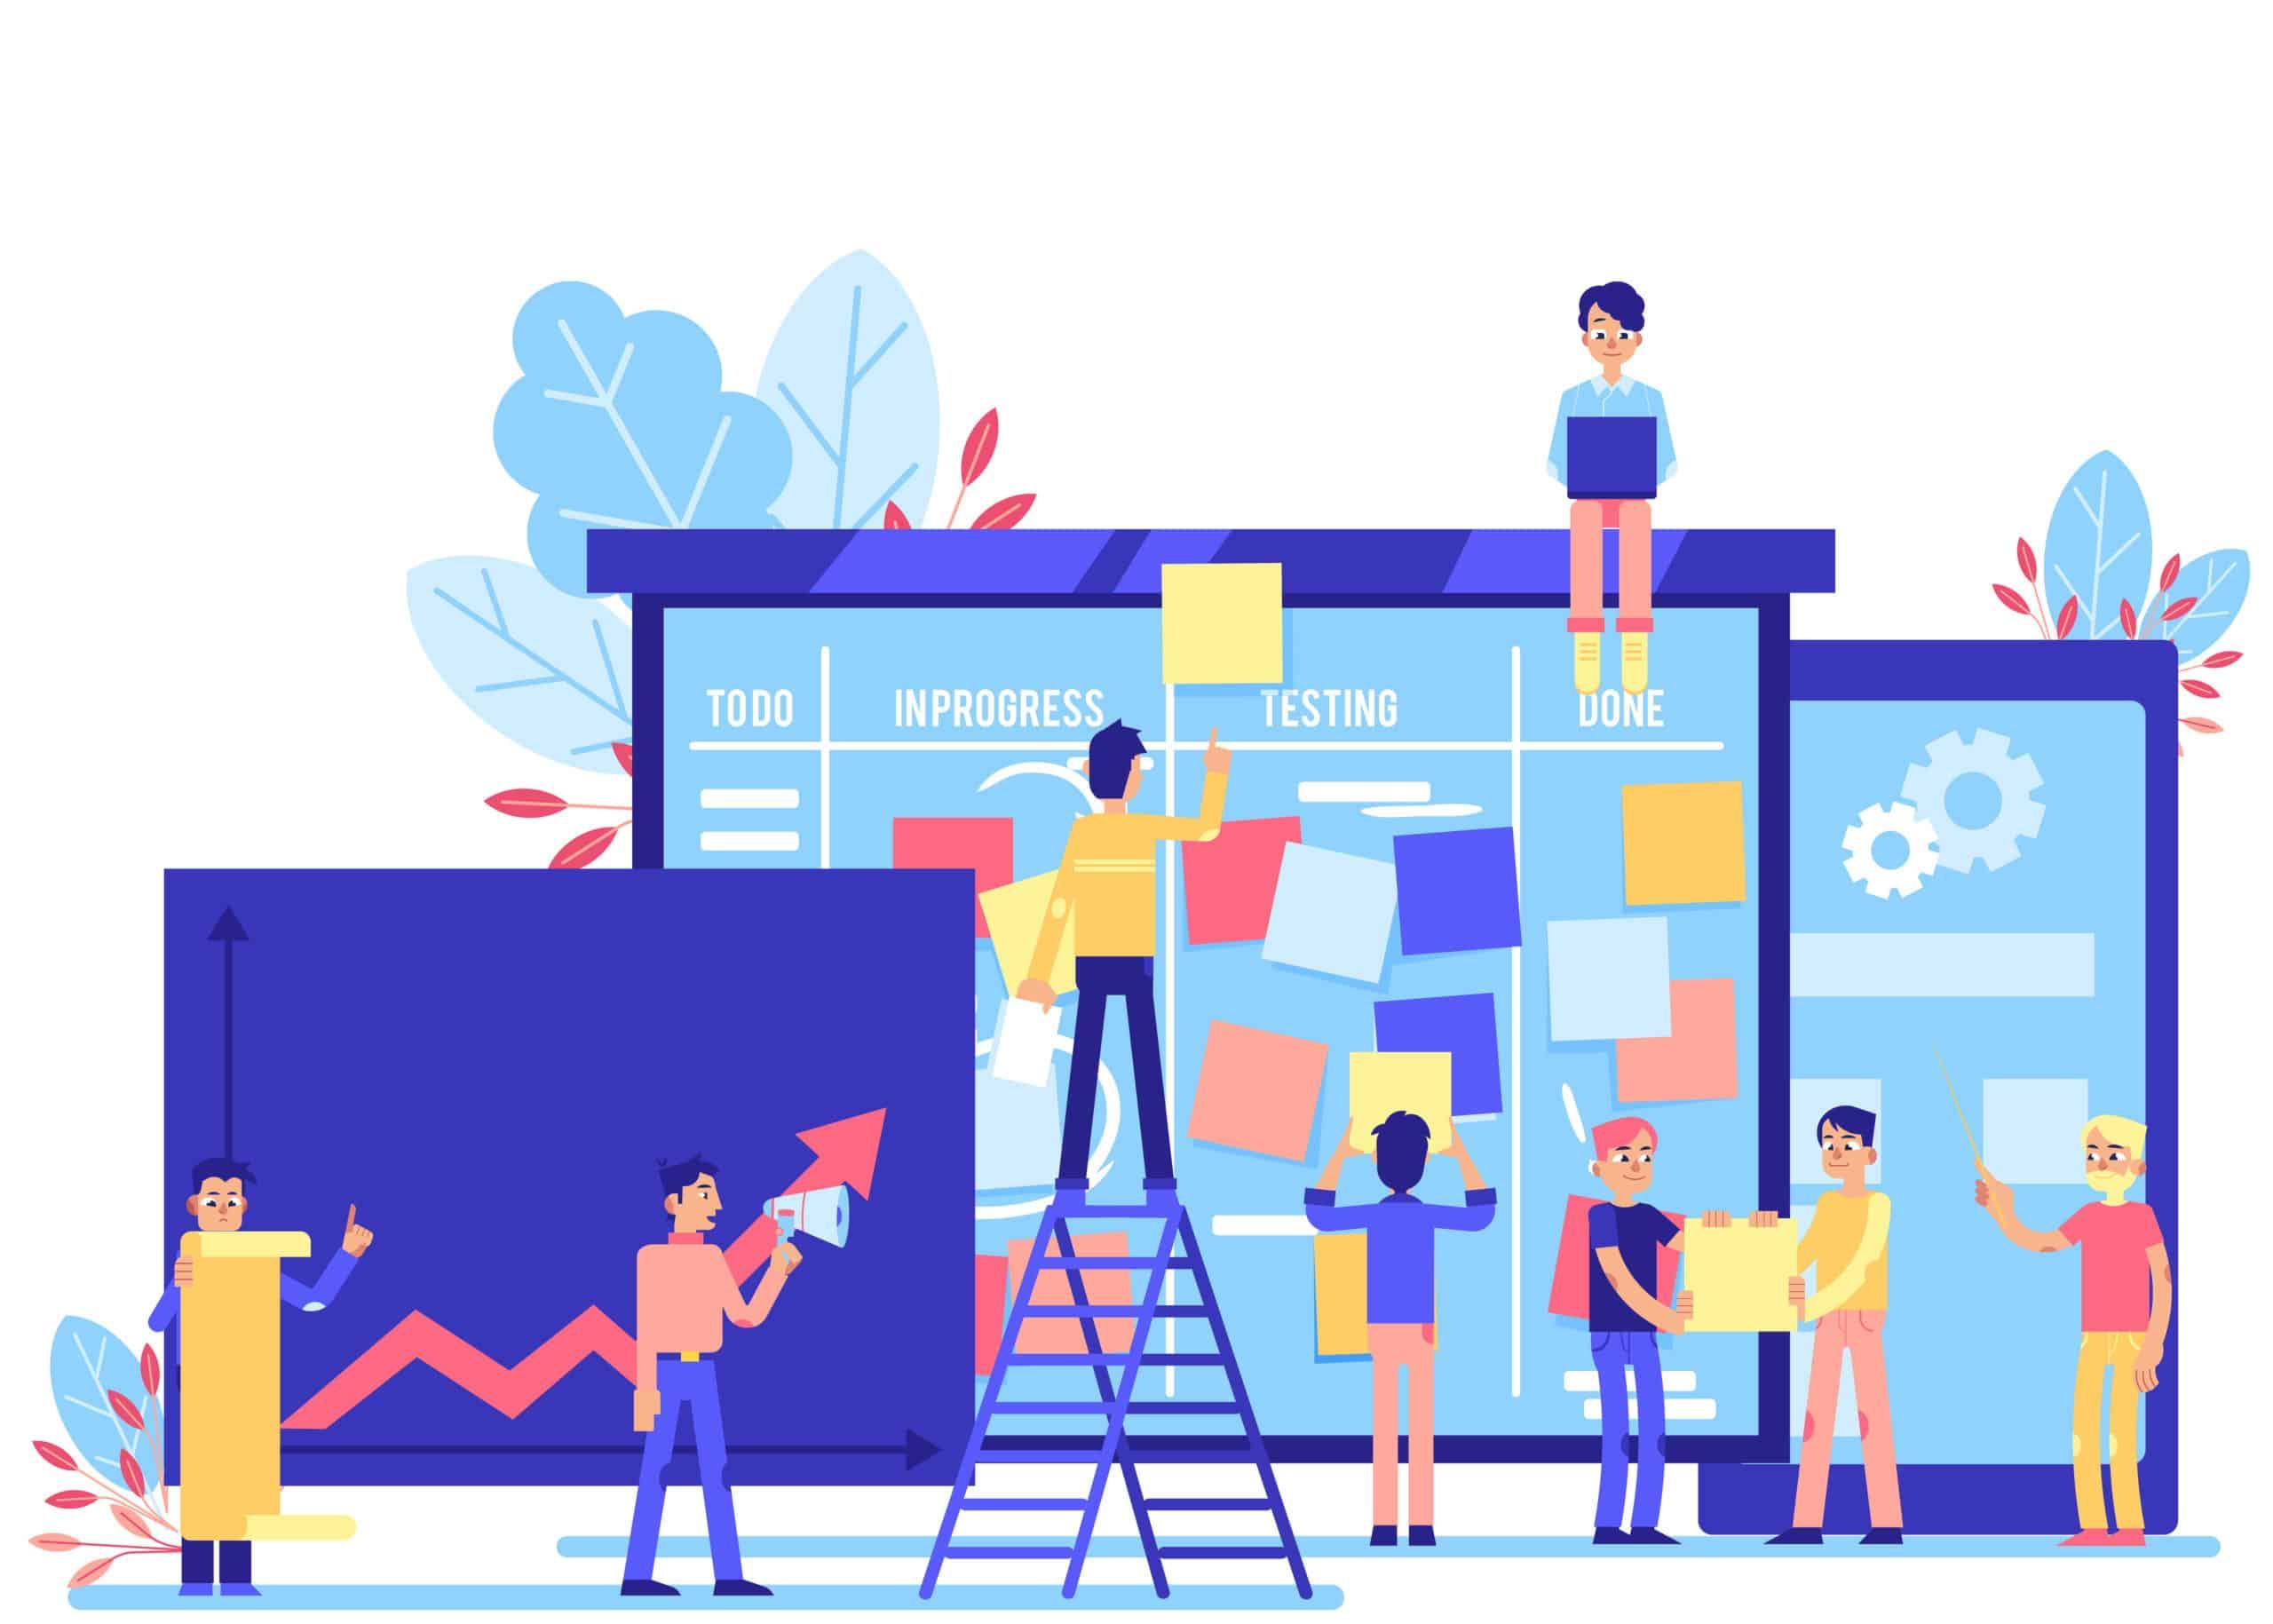 sprint 2020, scrum 2020, agile sprint meeting 2020, scrum sprint meeting essentials